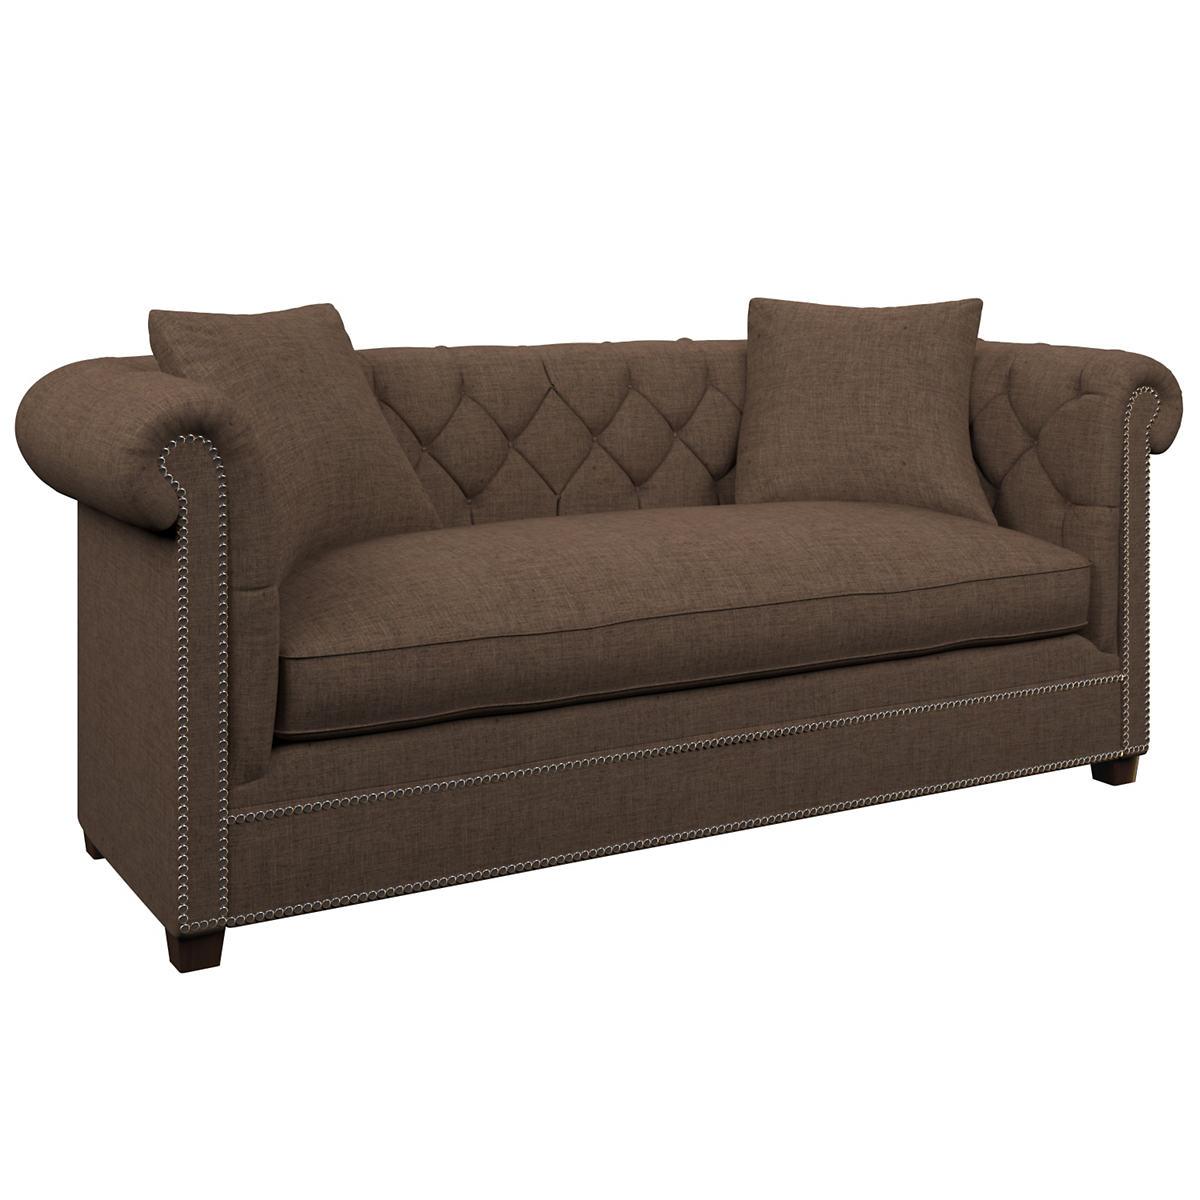 Greylock Brown Richmond Sofa